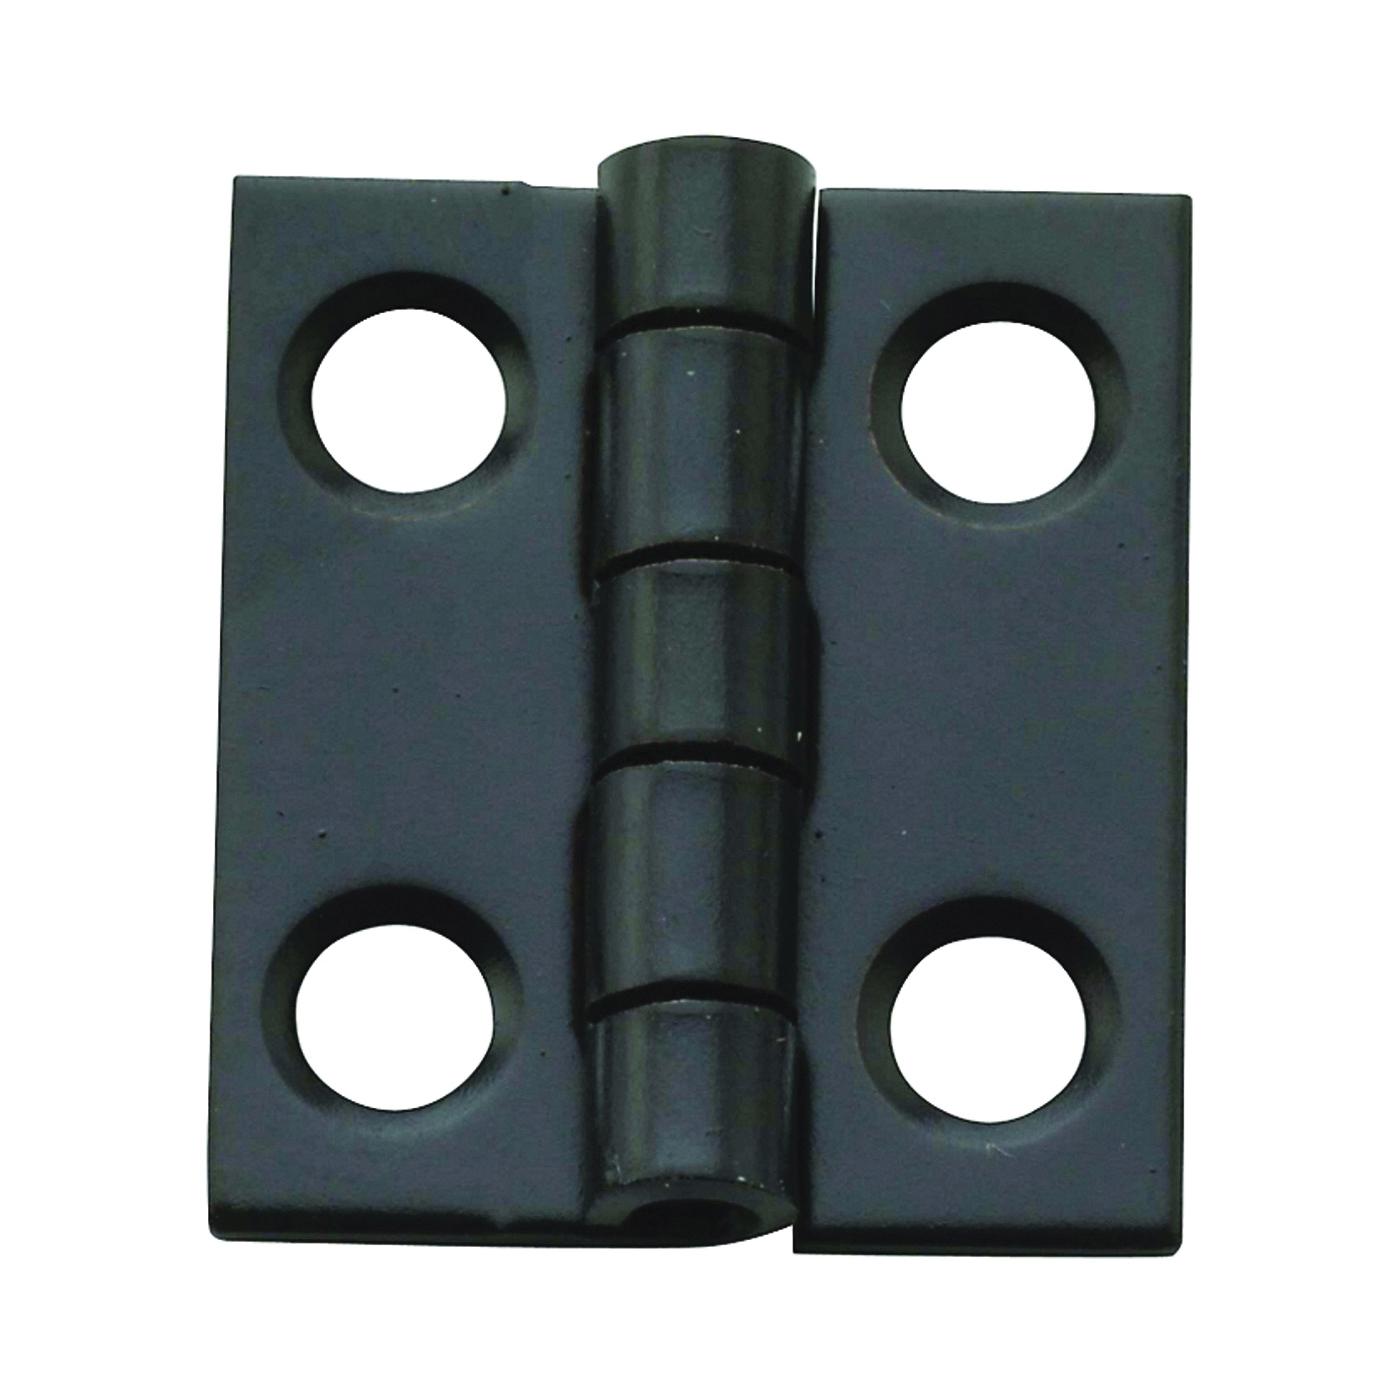 Picture of National Hardware N211-018 Decorative Narrow Hinge, 3/4 in H Door Leaf, 1/32 in Thick Door Leaf, Steel